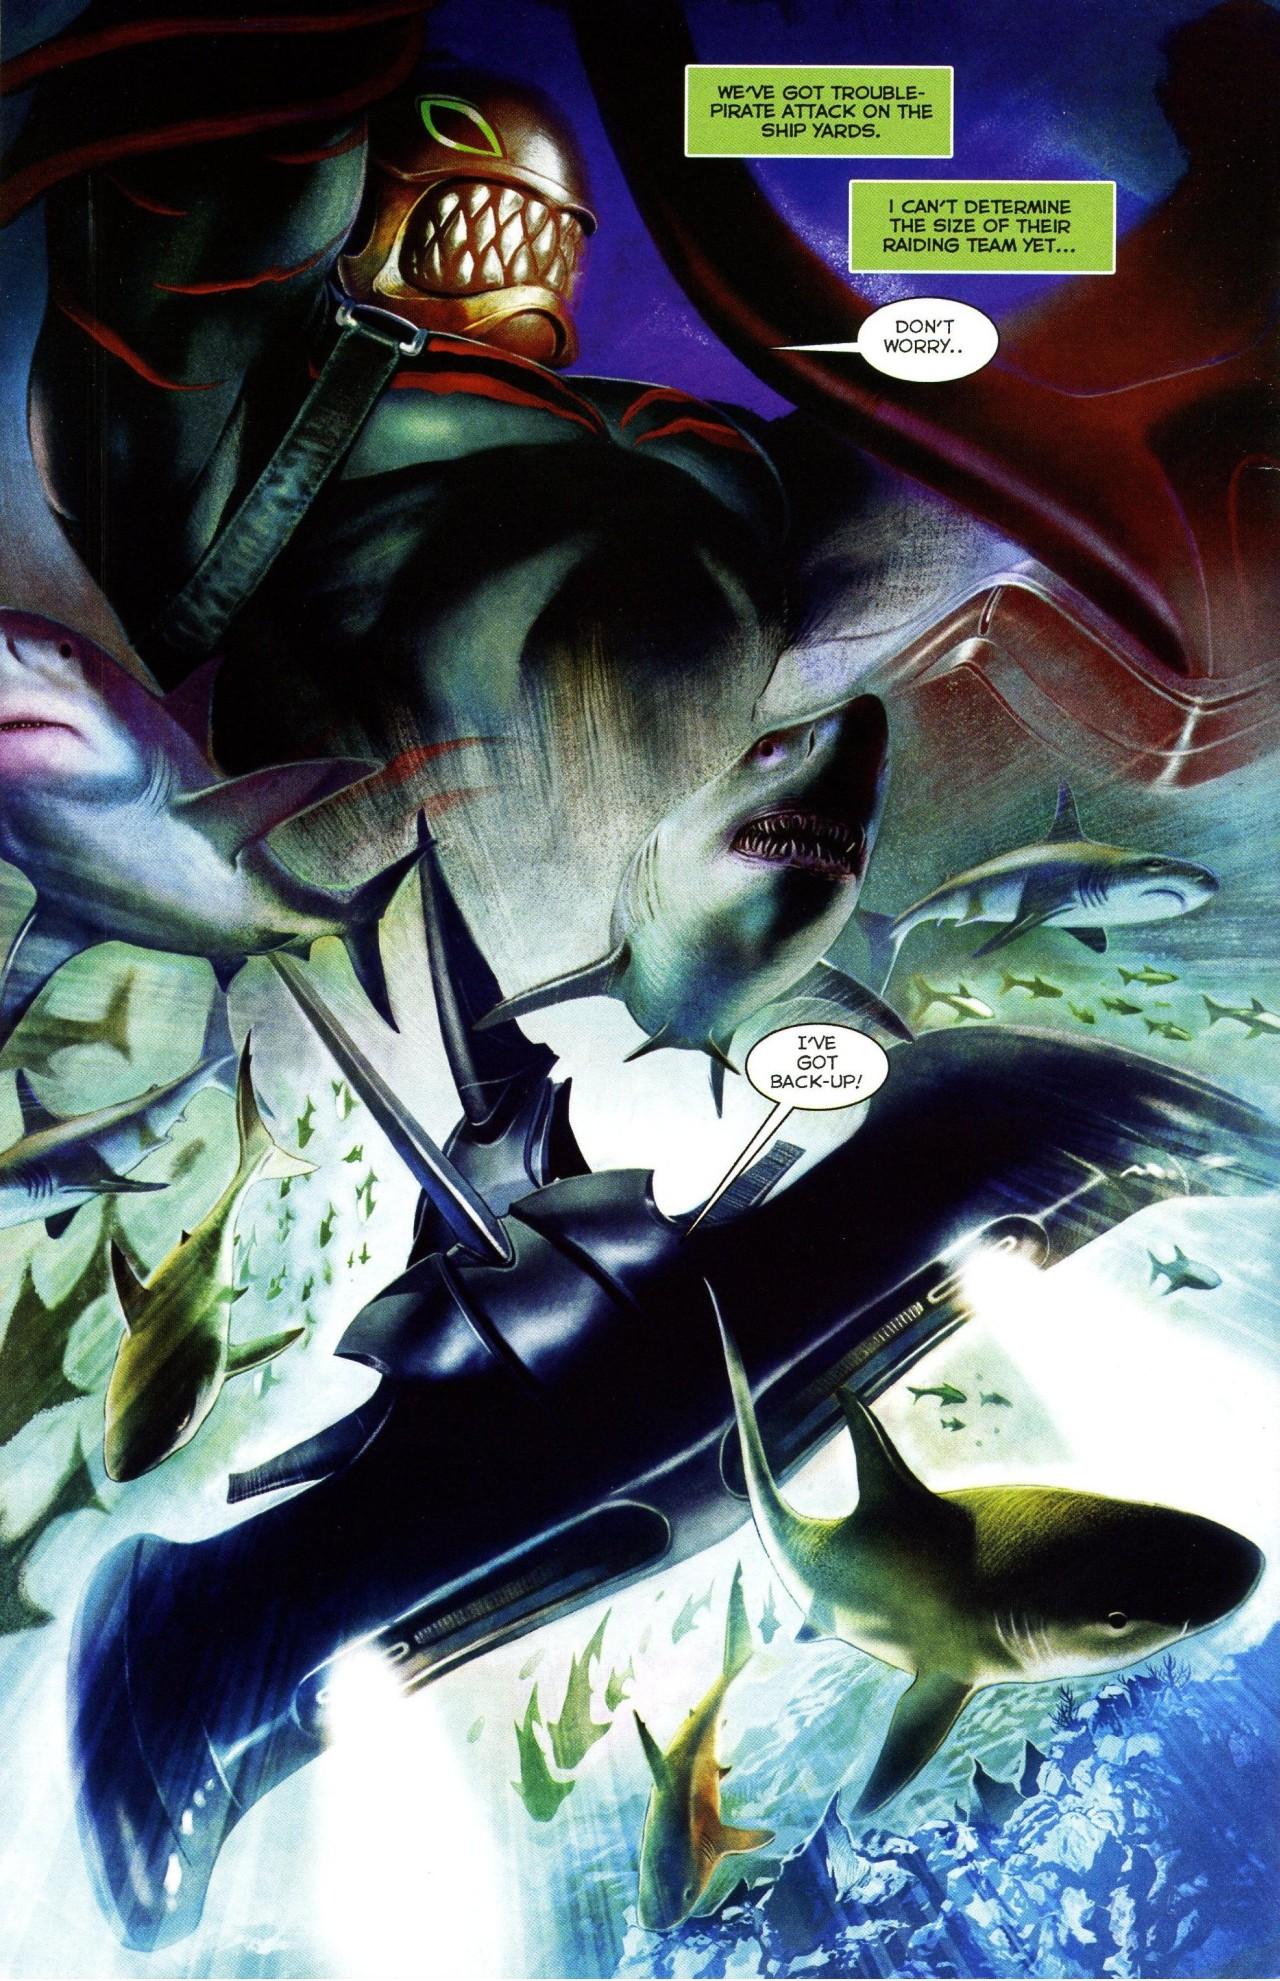 Read online Shark-Man comic -  Issue #3 - 23